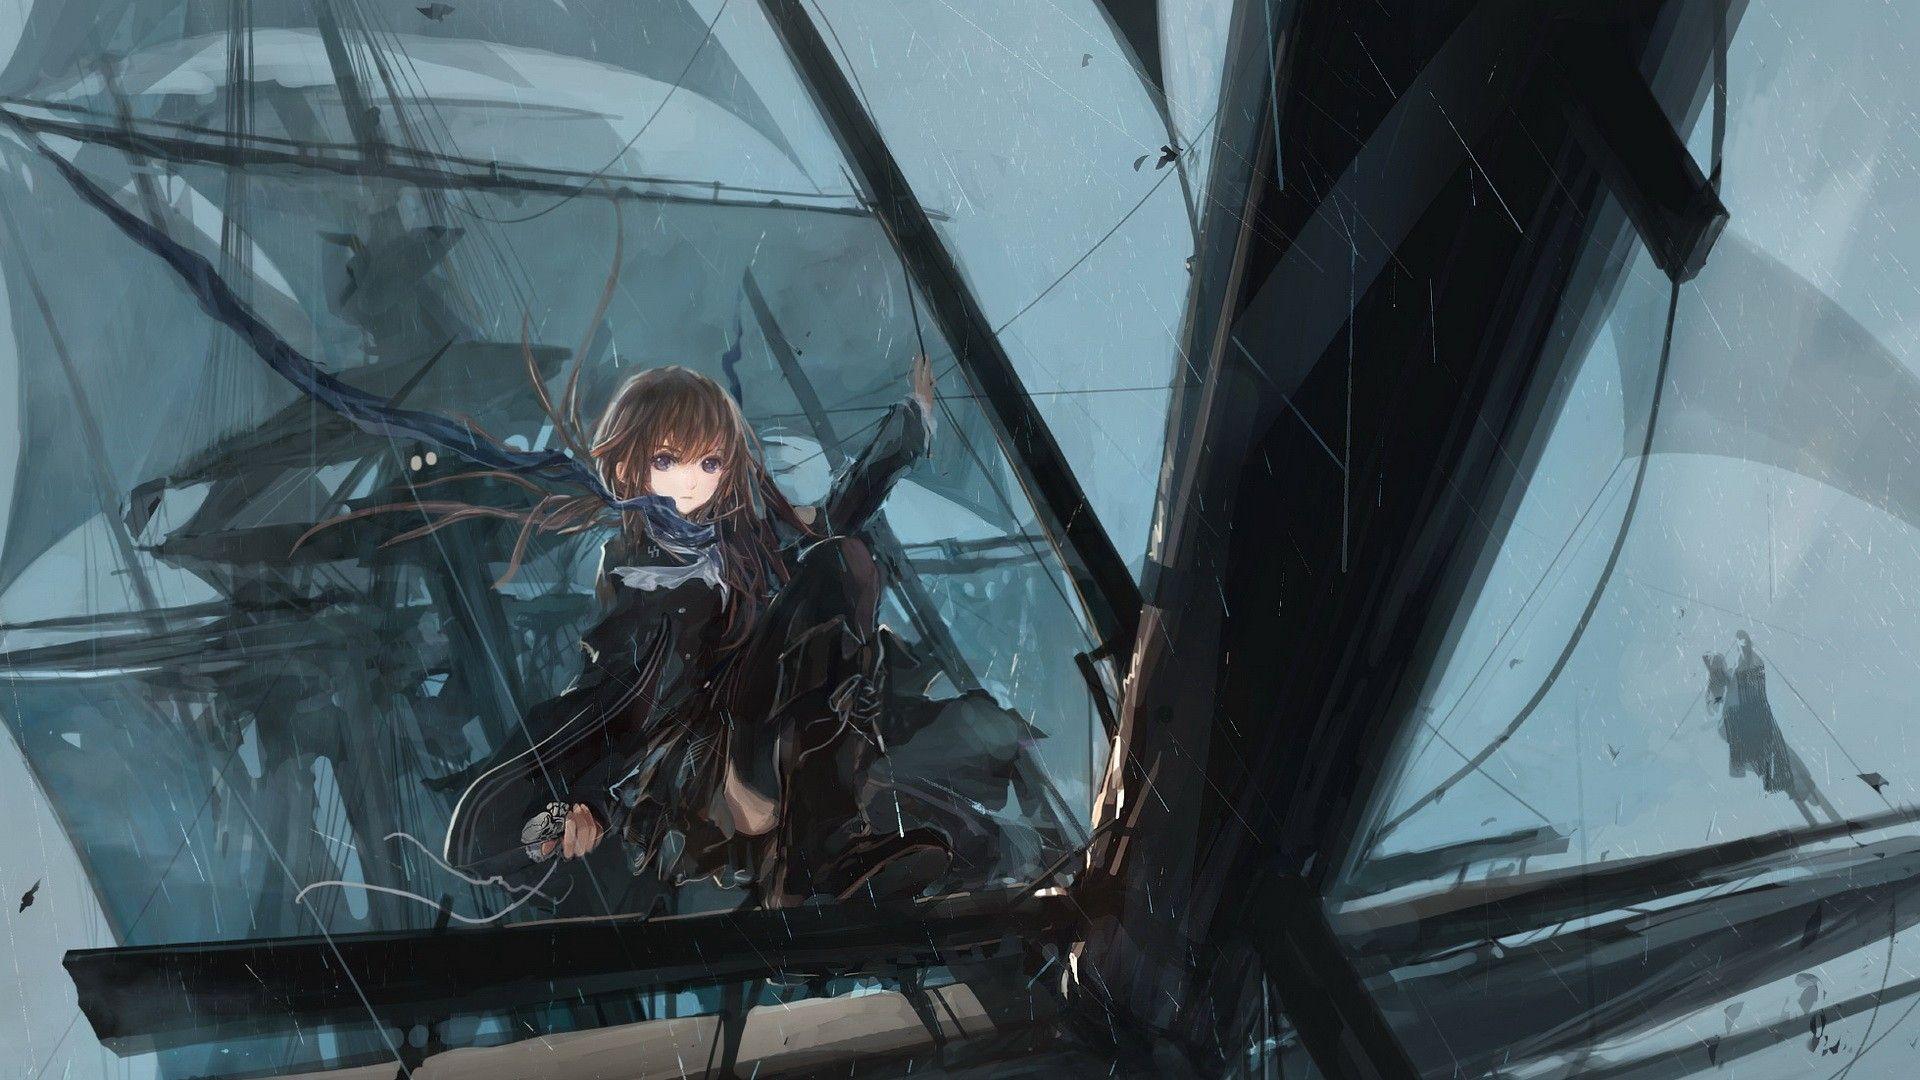 1920x1080 Anime Rain Drawing HD Wallpaper